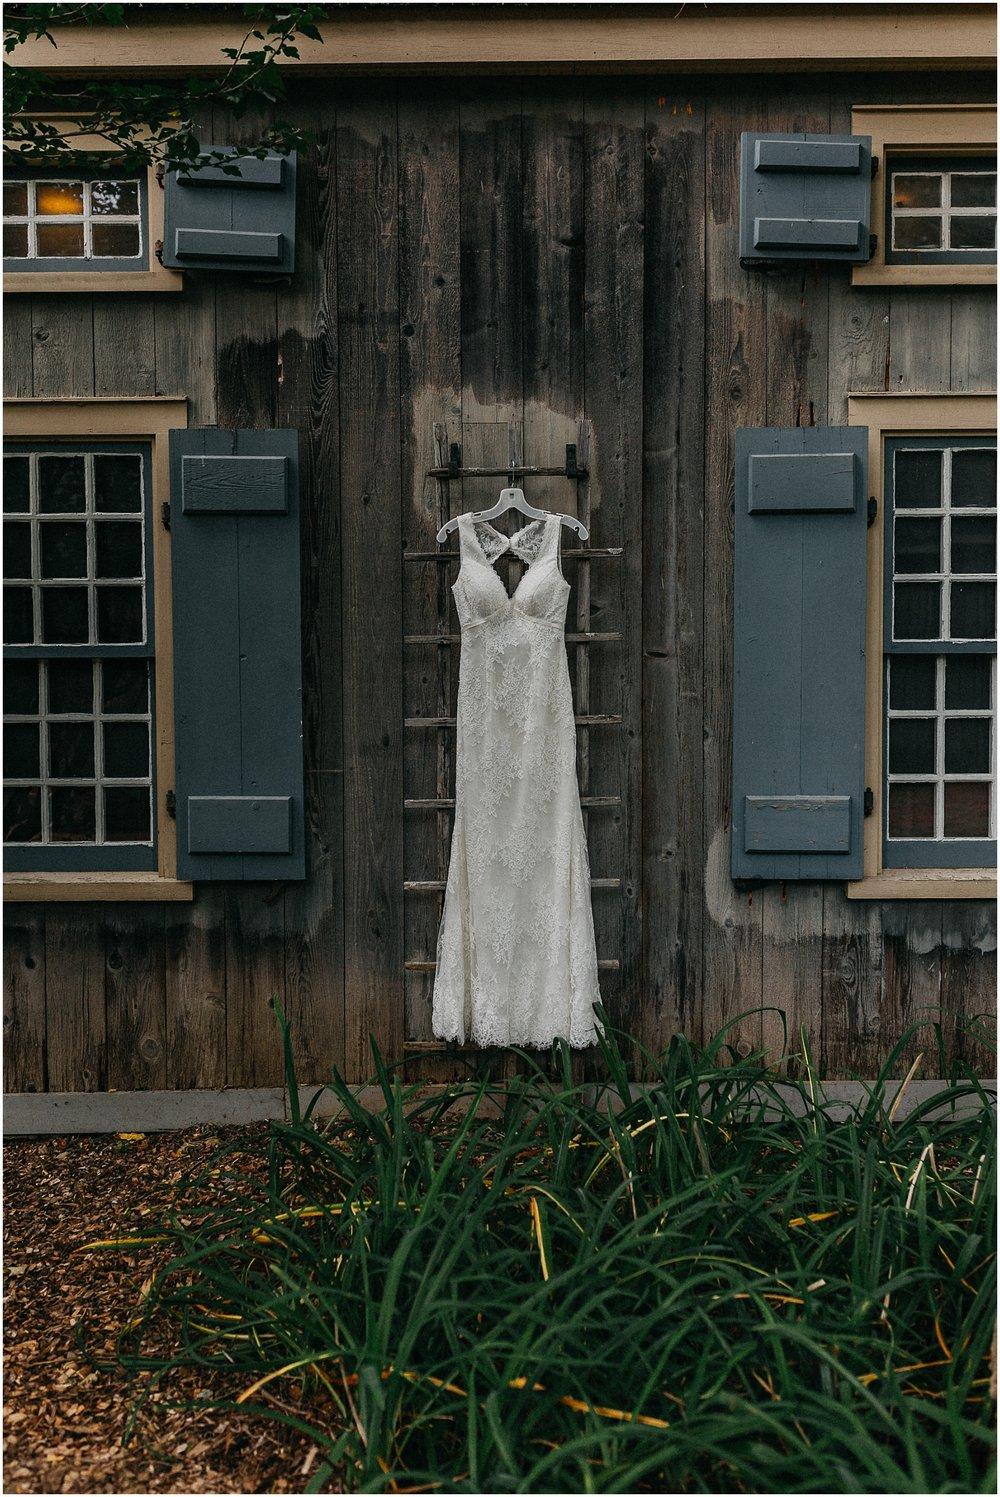 waterloo-village-waterloo village-wedding-outdoor wedding-rustic-boemian-new jersey-bride-groom-wedding party-davids bridal-wedding dress-wedding-first kiss-intimate wedding_0347.jpg